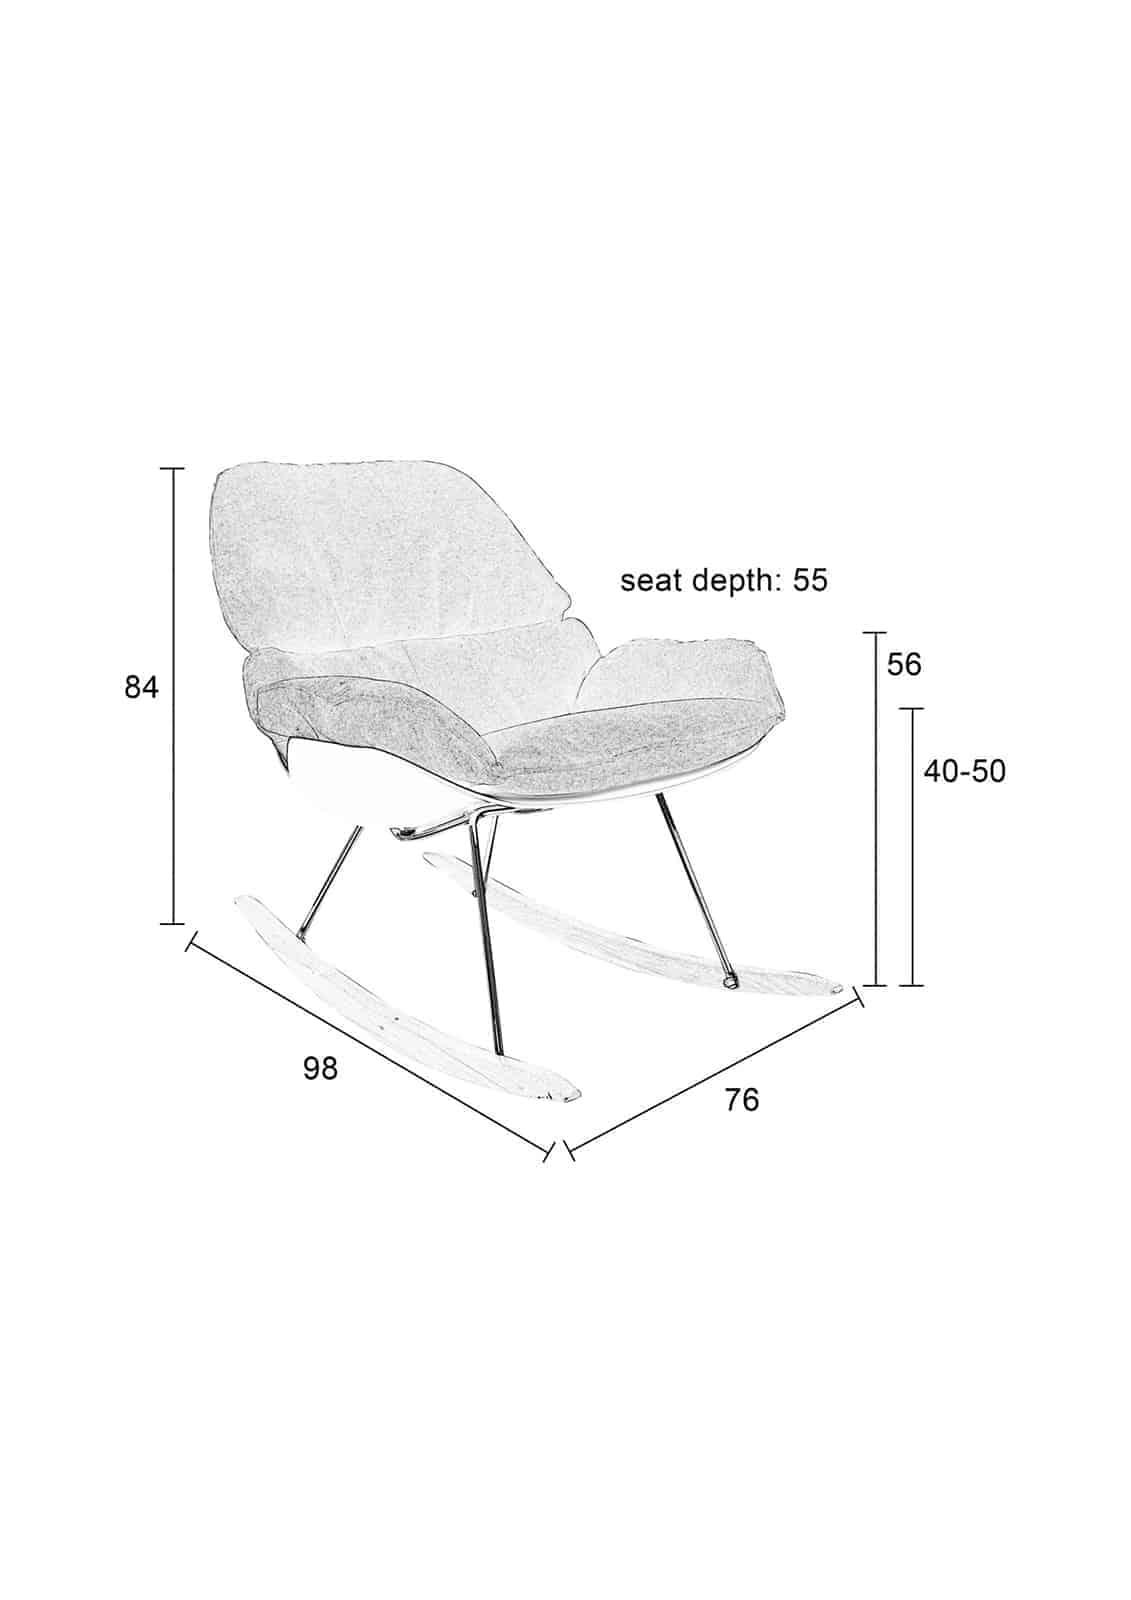 rocky dark chair size guide